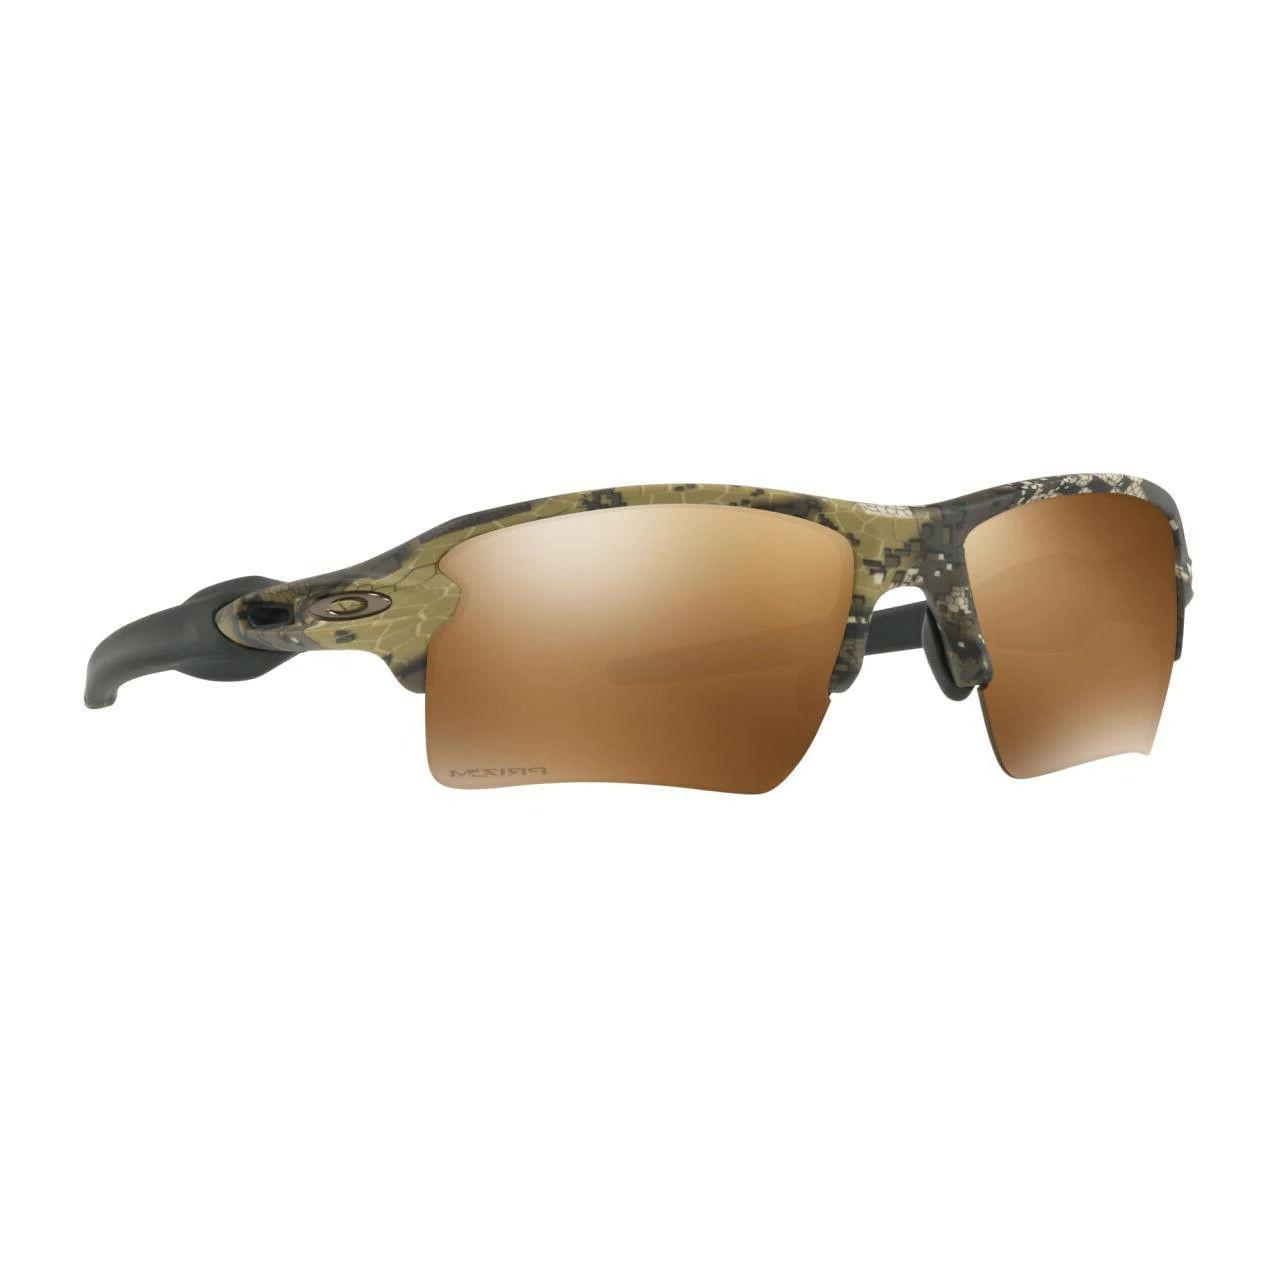 sunglasses flak 2 0 xl desolve bare